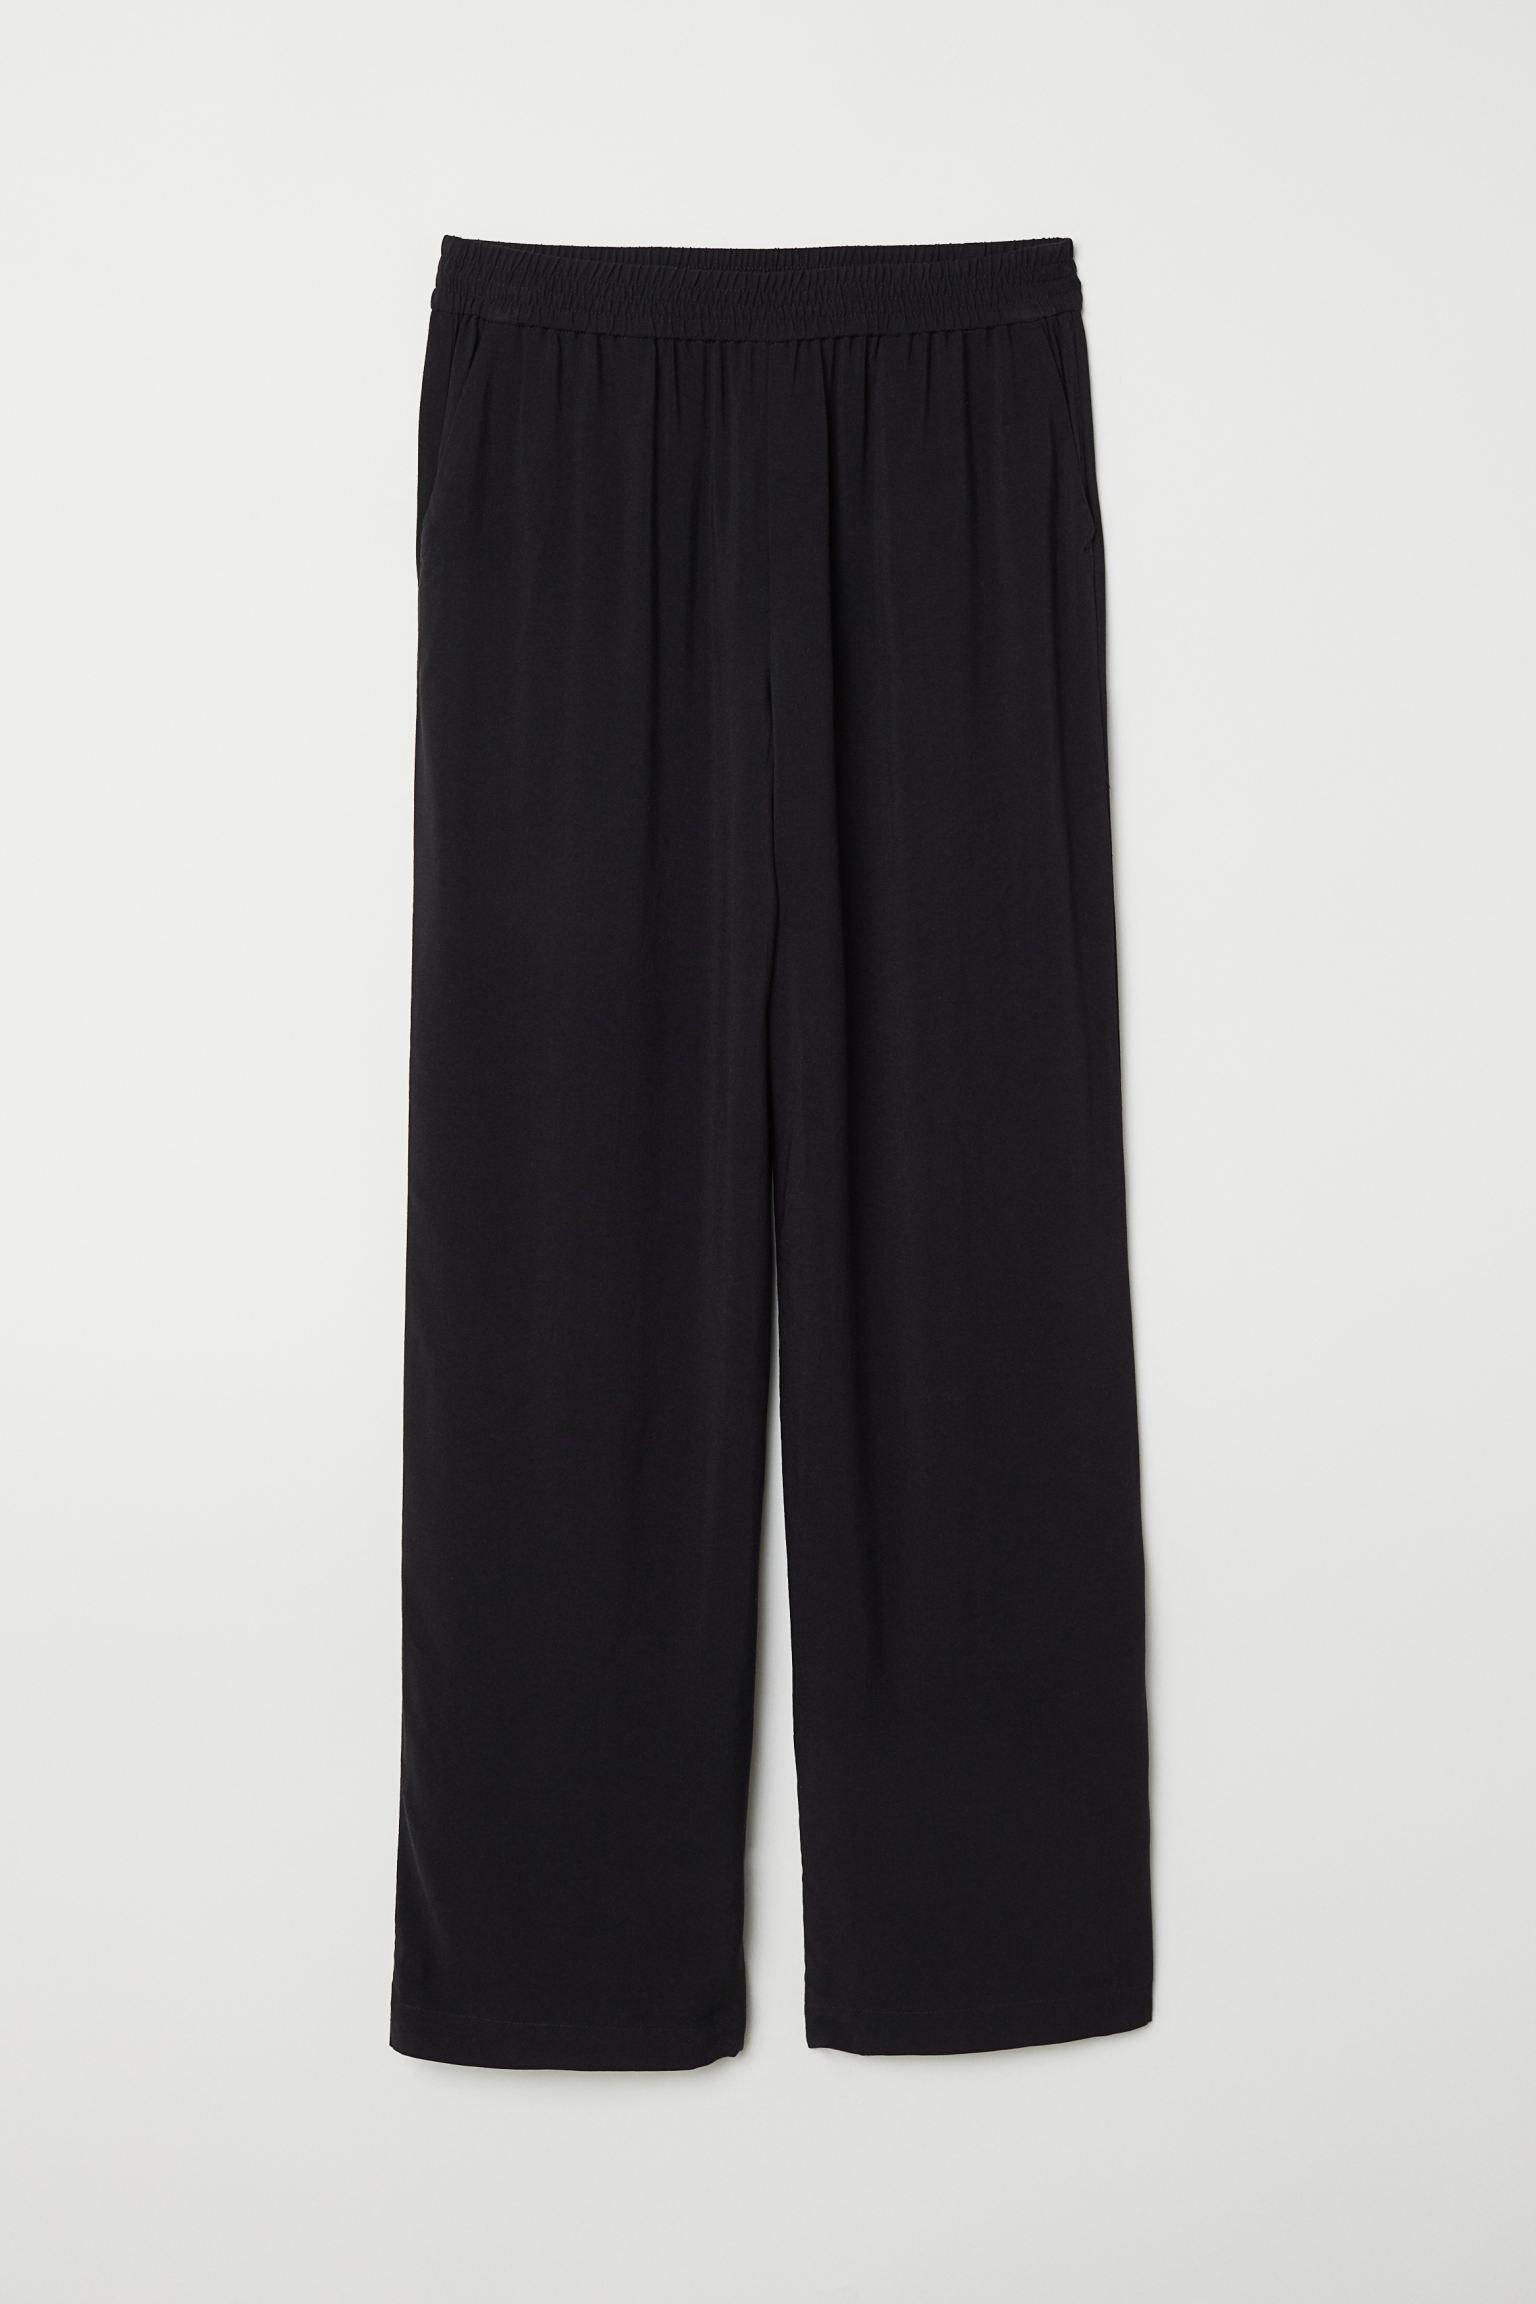 Отзыв на Широкие брюки из Интернет-Магазина H&M